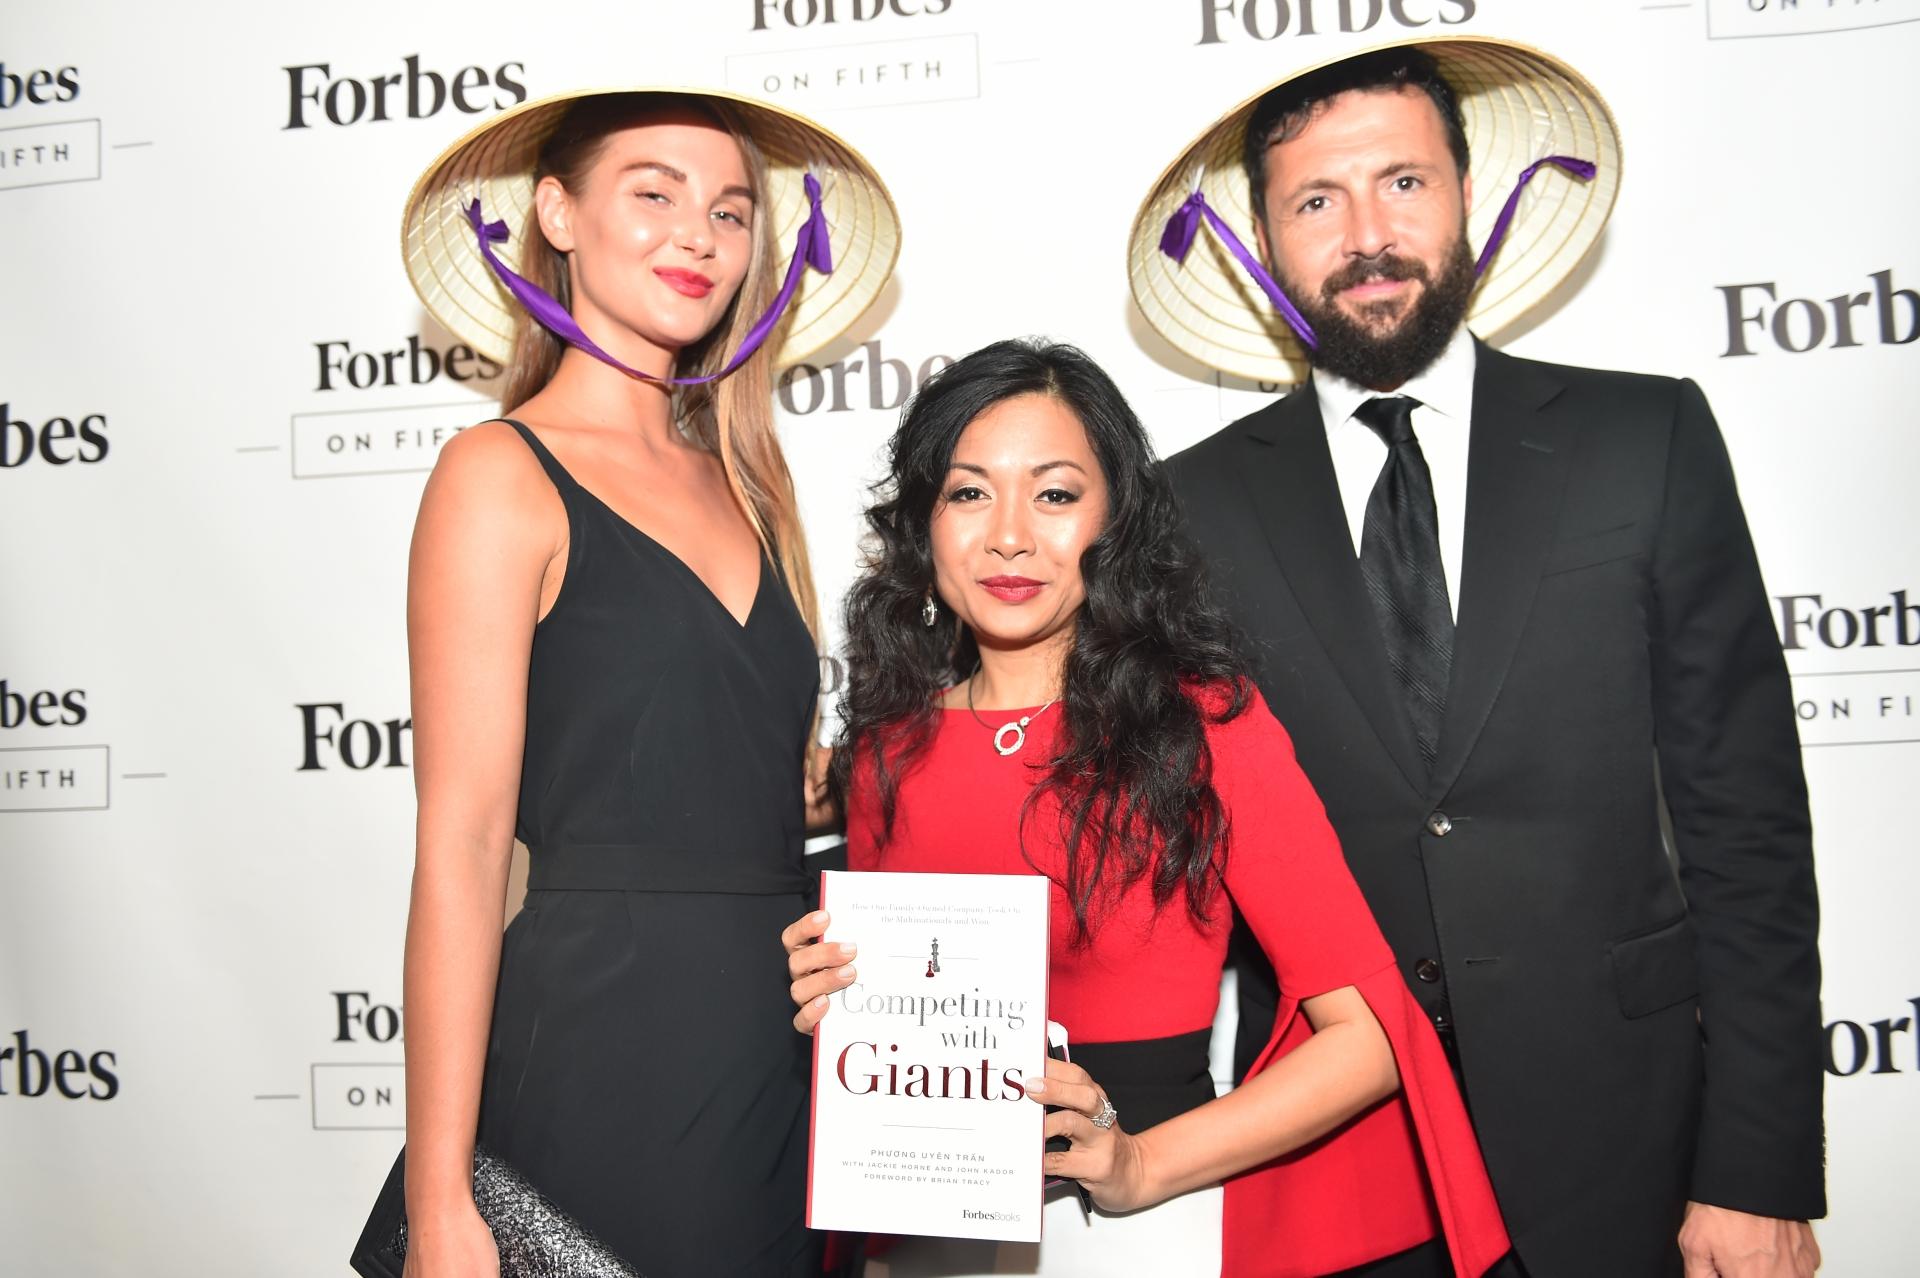 vietnamese businesswoman launches book in new york